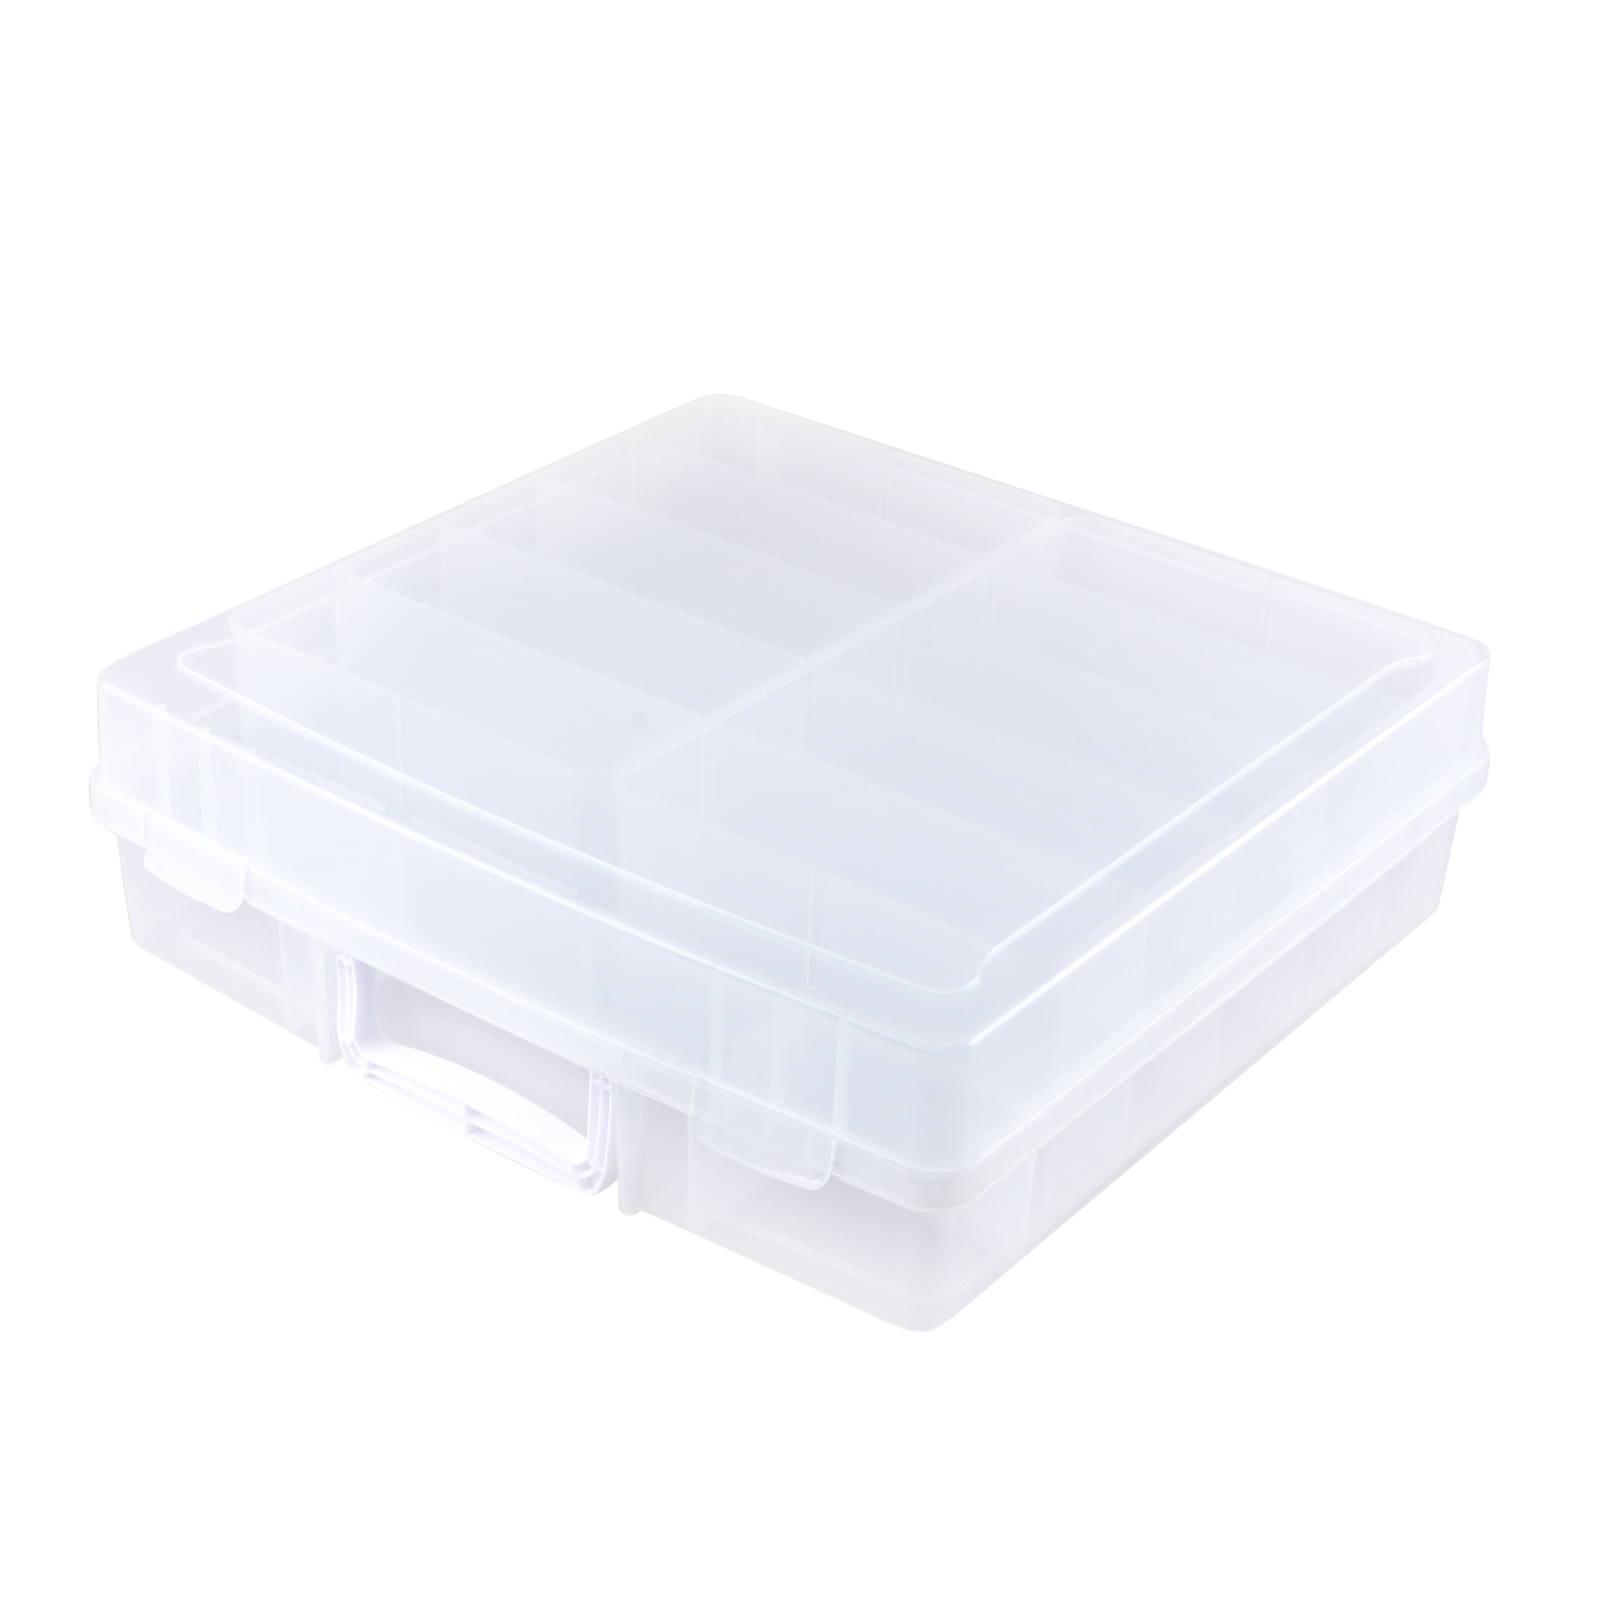 Washi Storage Box